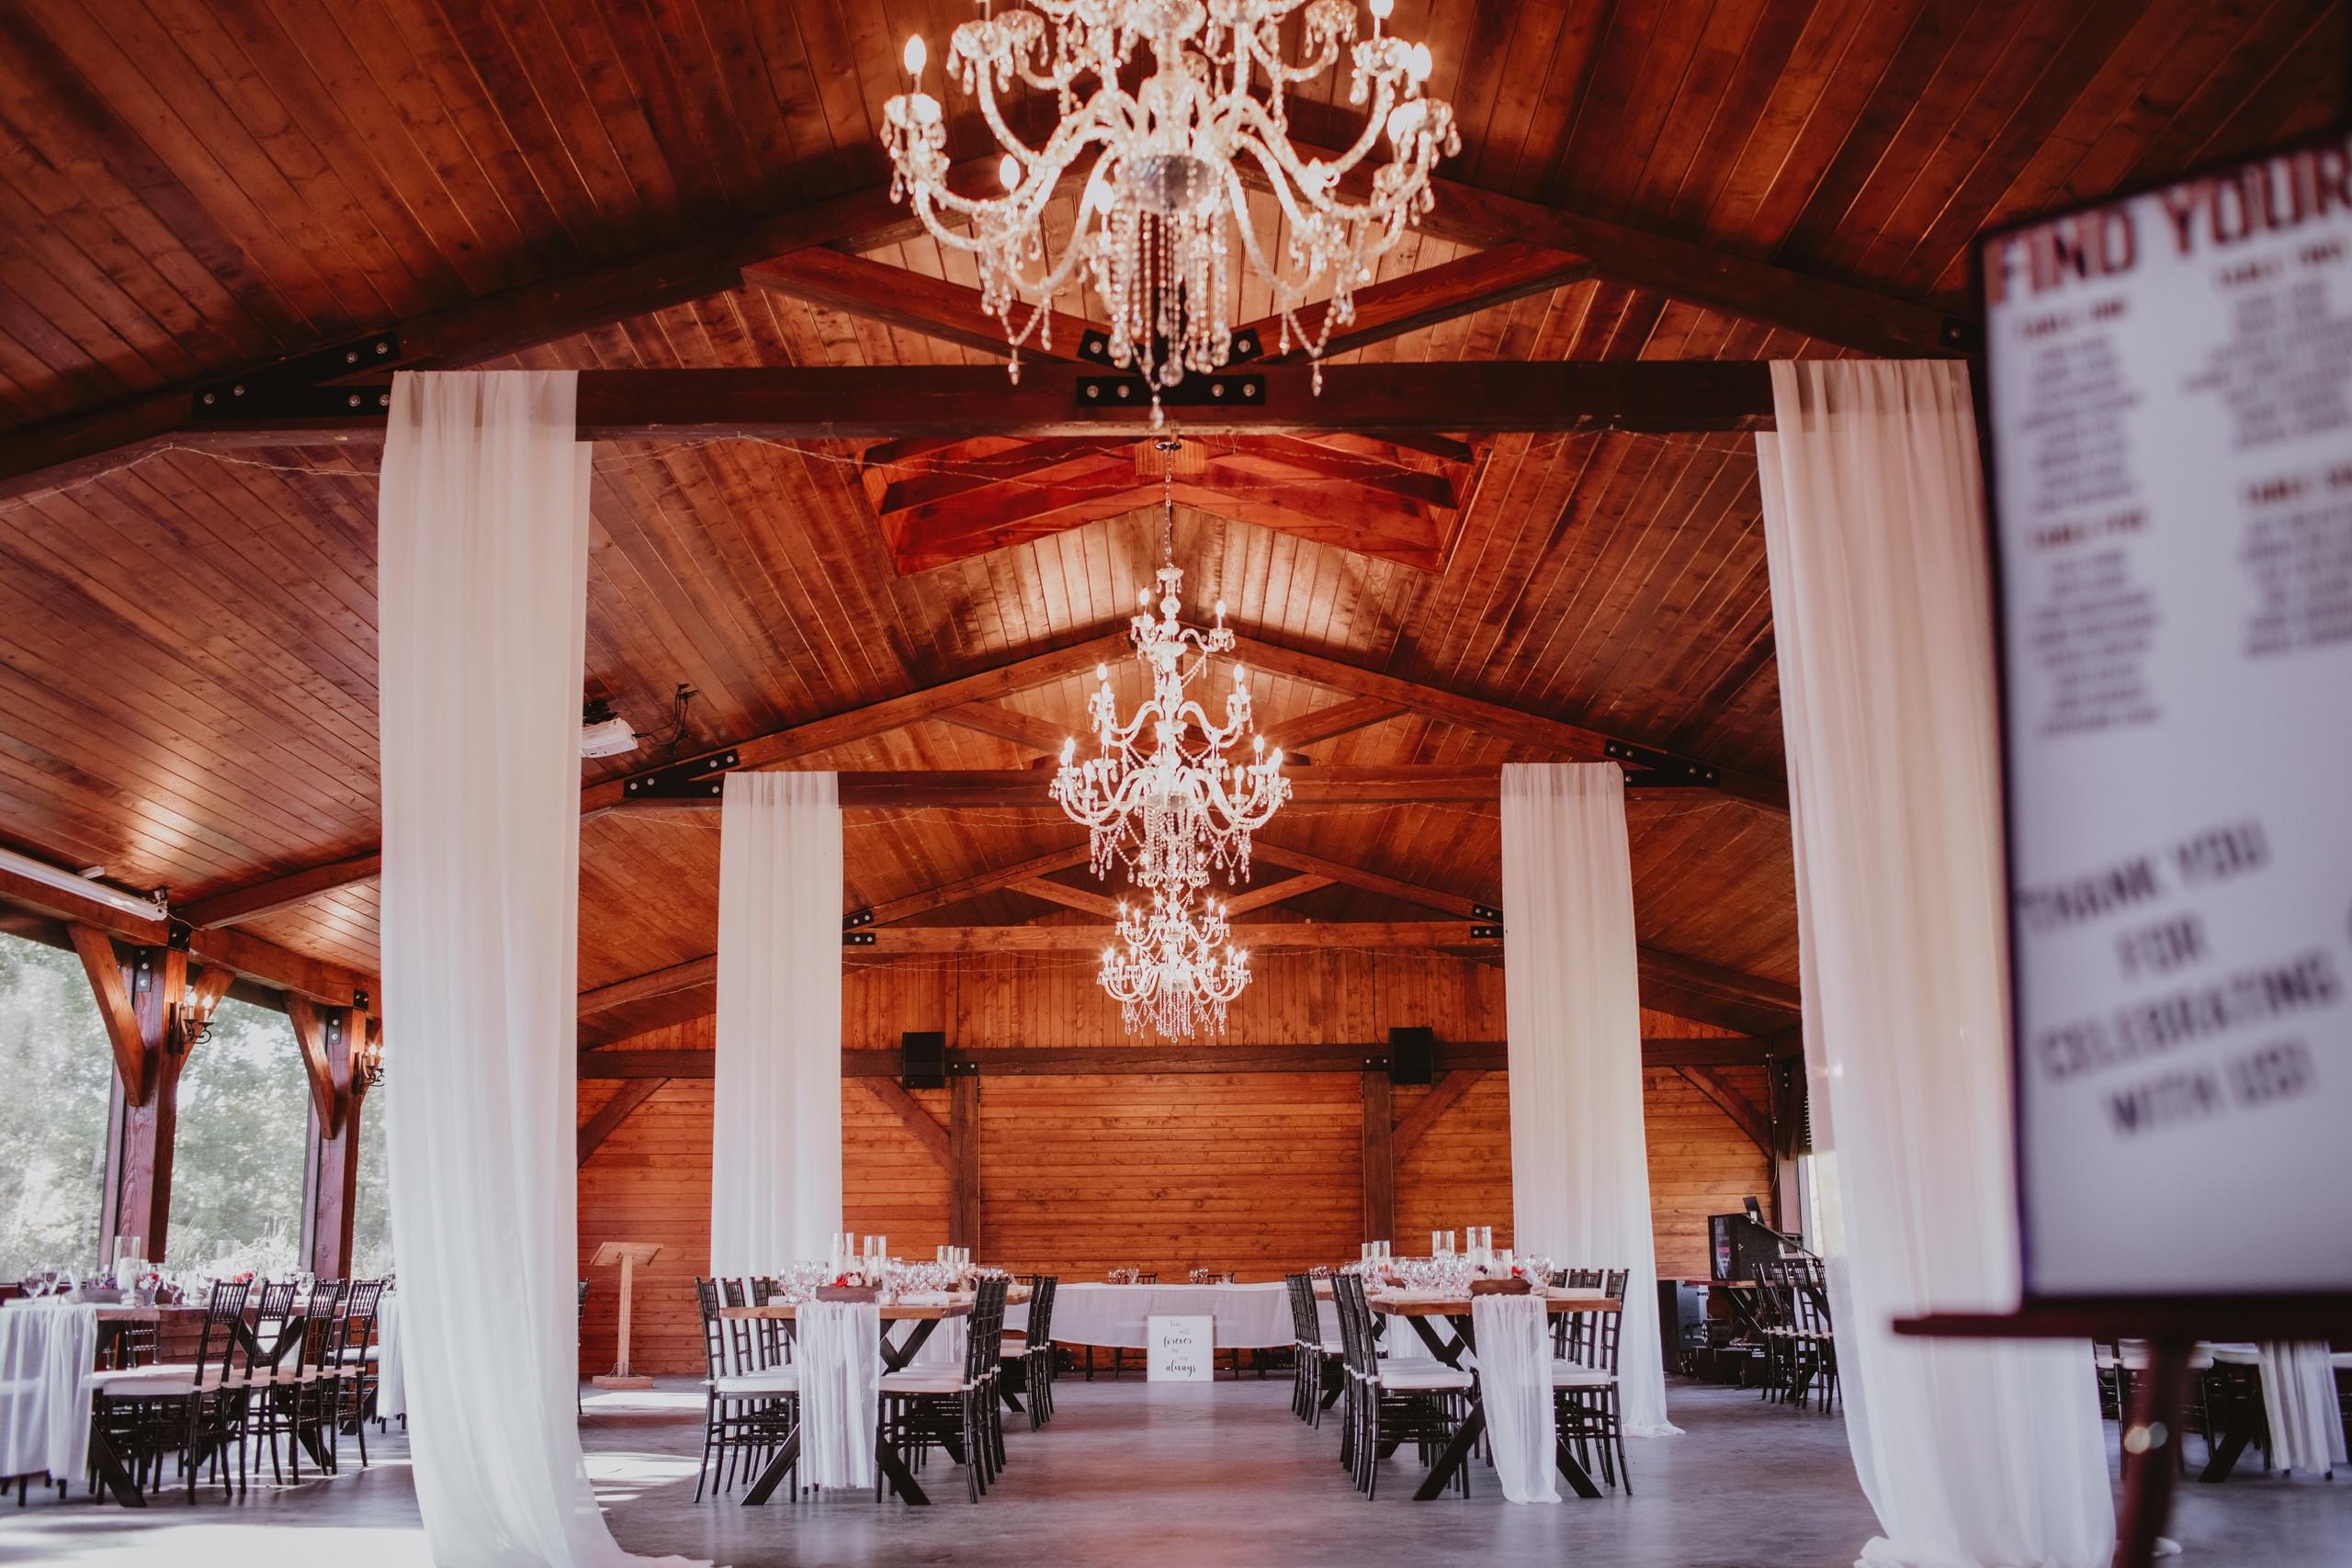 Stunning Chandeliers in Manitoba wedding venue - Rivers Edge Resort.